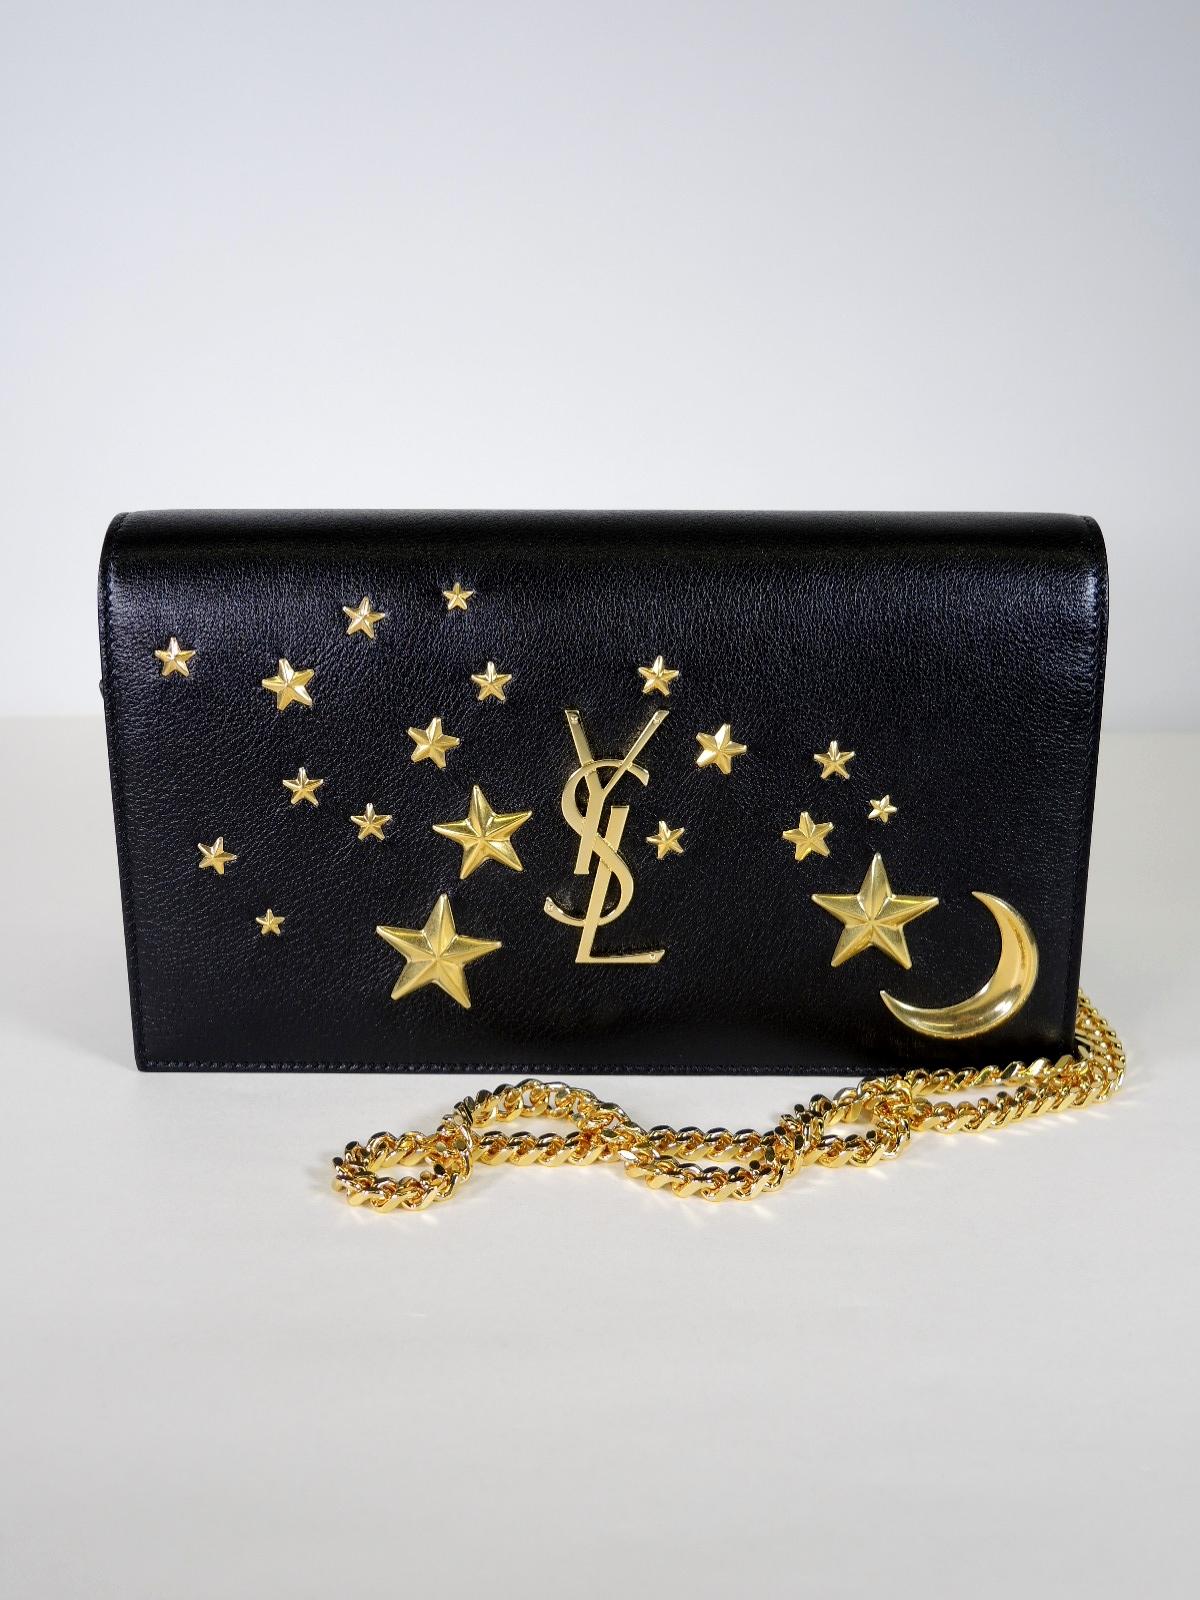 Kids & Baby's Bags Crossbody Bags Just Cute Girl Crossbody Bag Cartoon Moon Star Handbag Shinny Glitter Star Crossbody Purse Wallet Stars Handbag Price Remains Stable